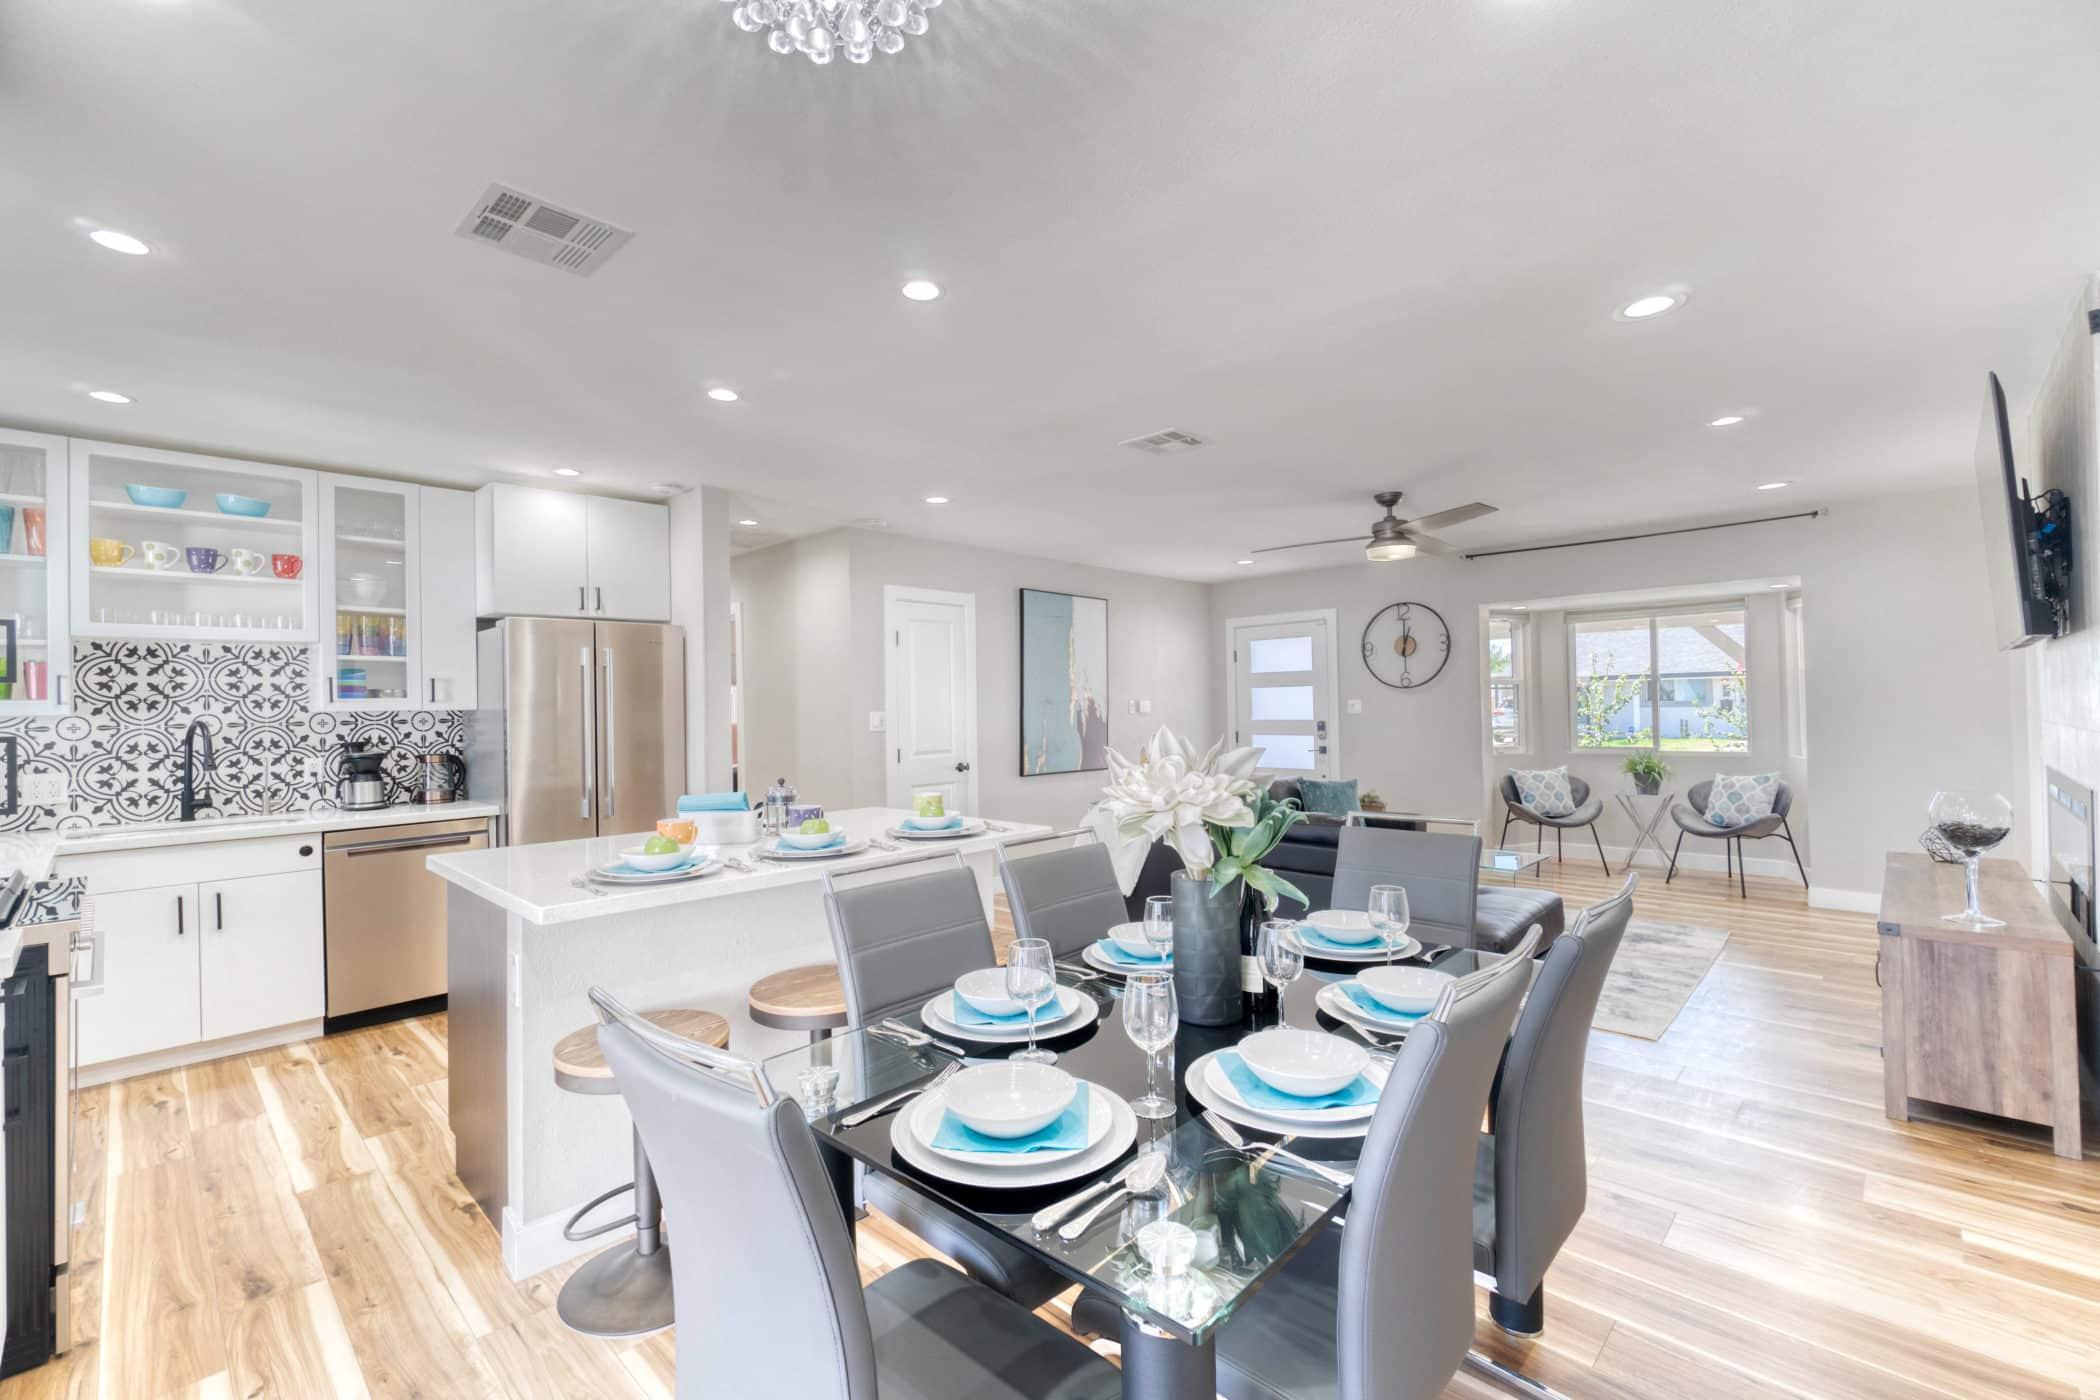 A White remodel kitchen